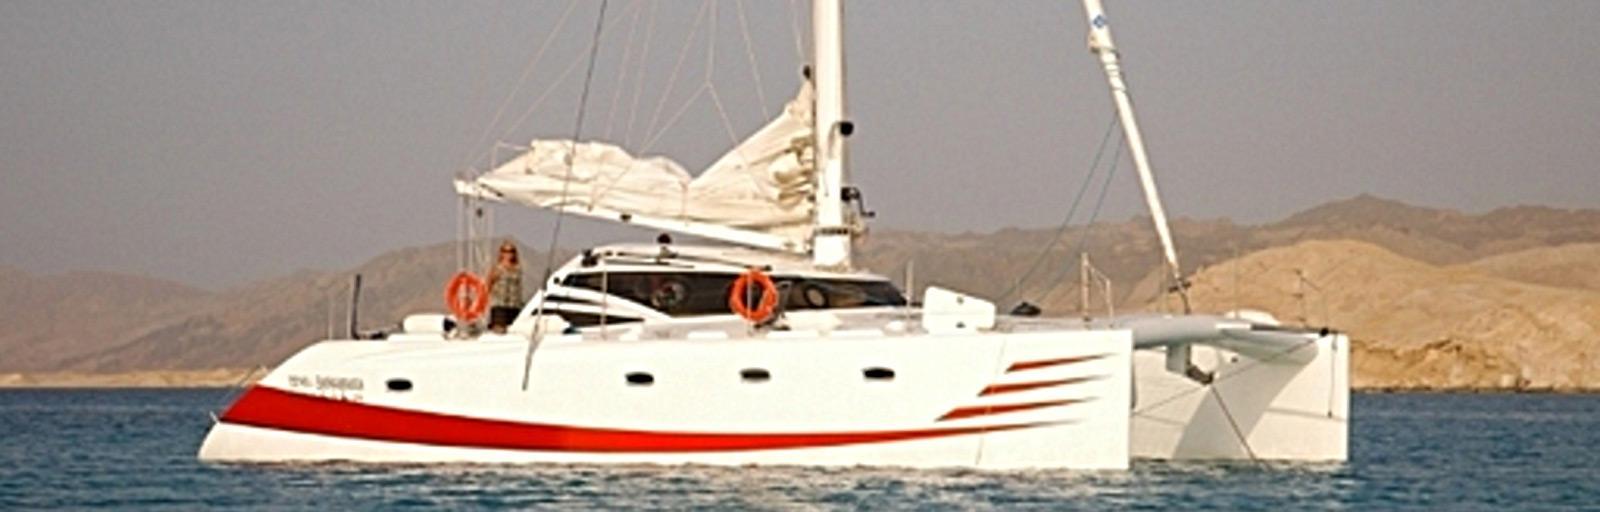 AYC Yachtbroker - VIK 125